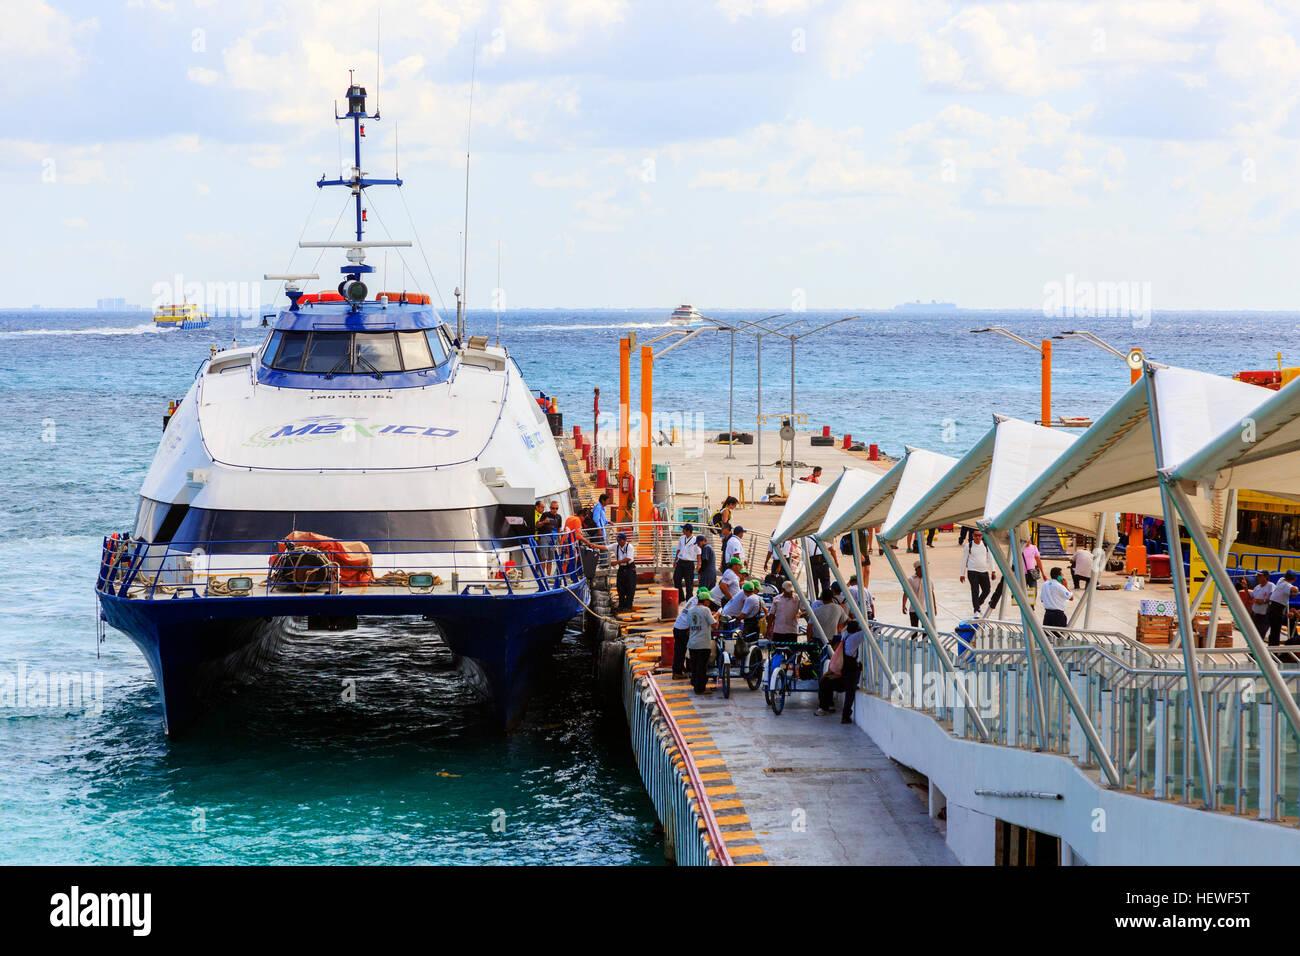 Ferries at the pier at Playa Del Carmen, Riviera Maya, Mexico. Ferries sail to Cozumel - Stock Image